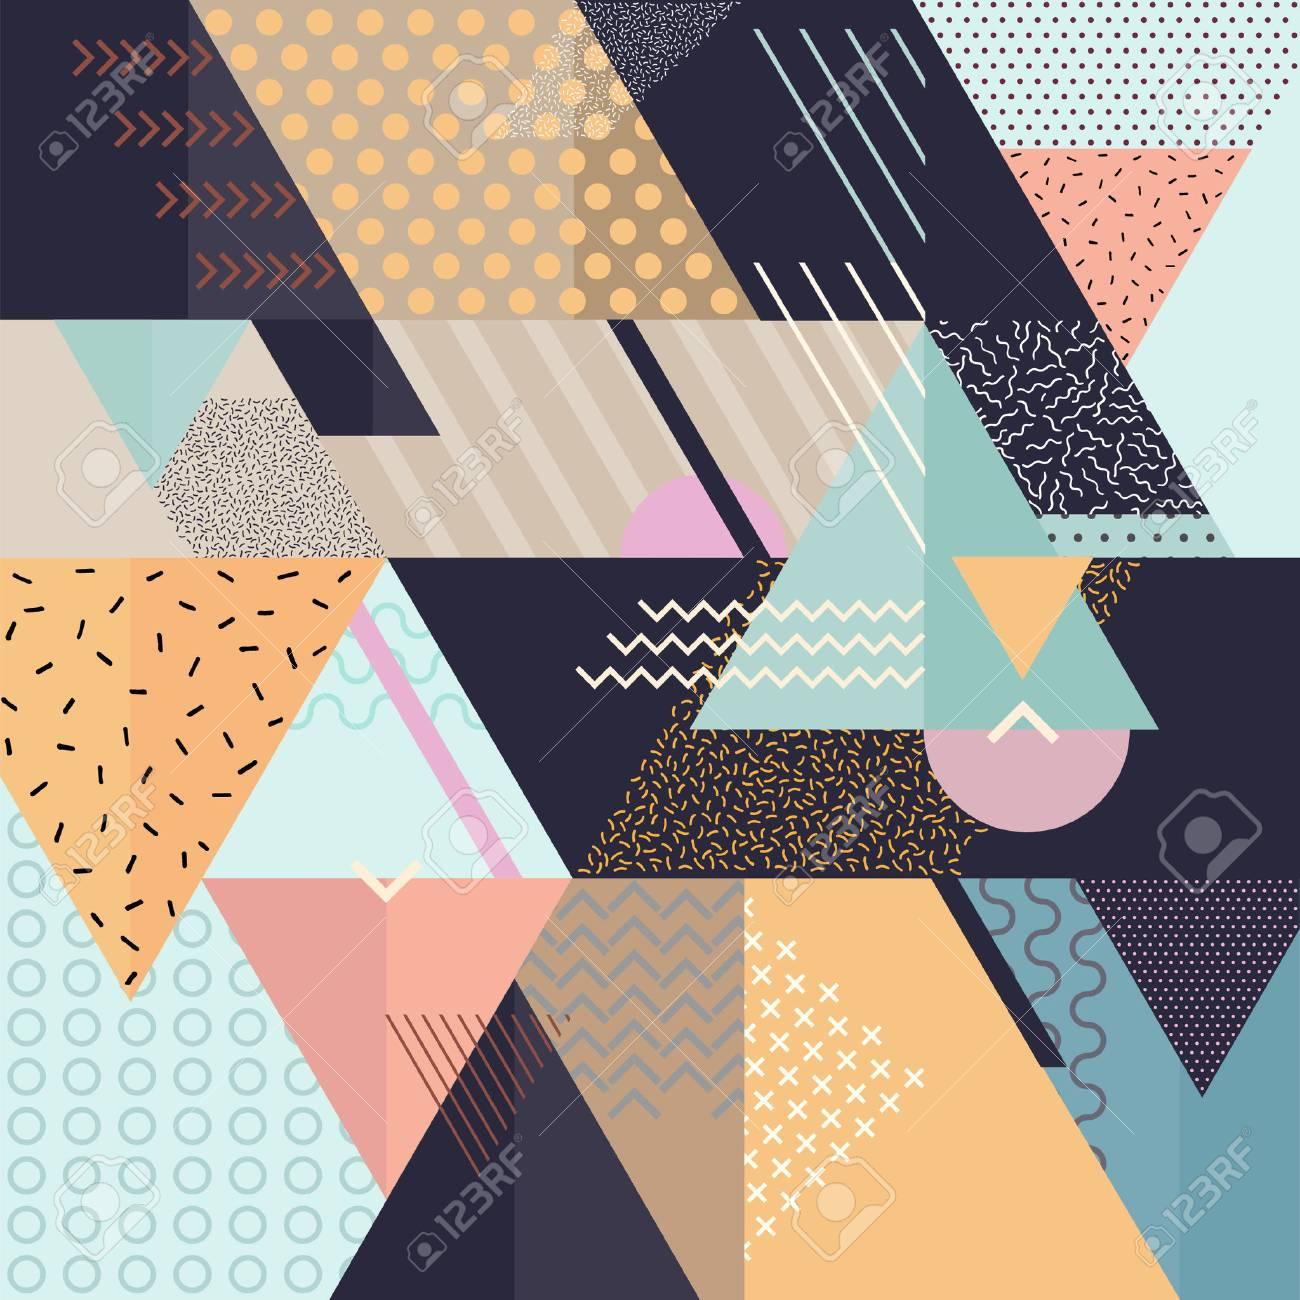 Art geometric background - 54352802